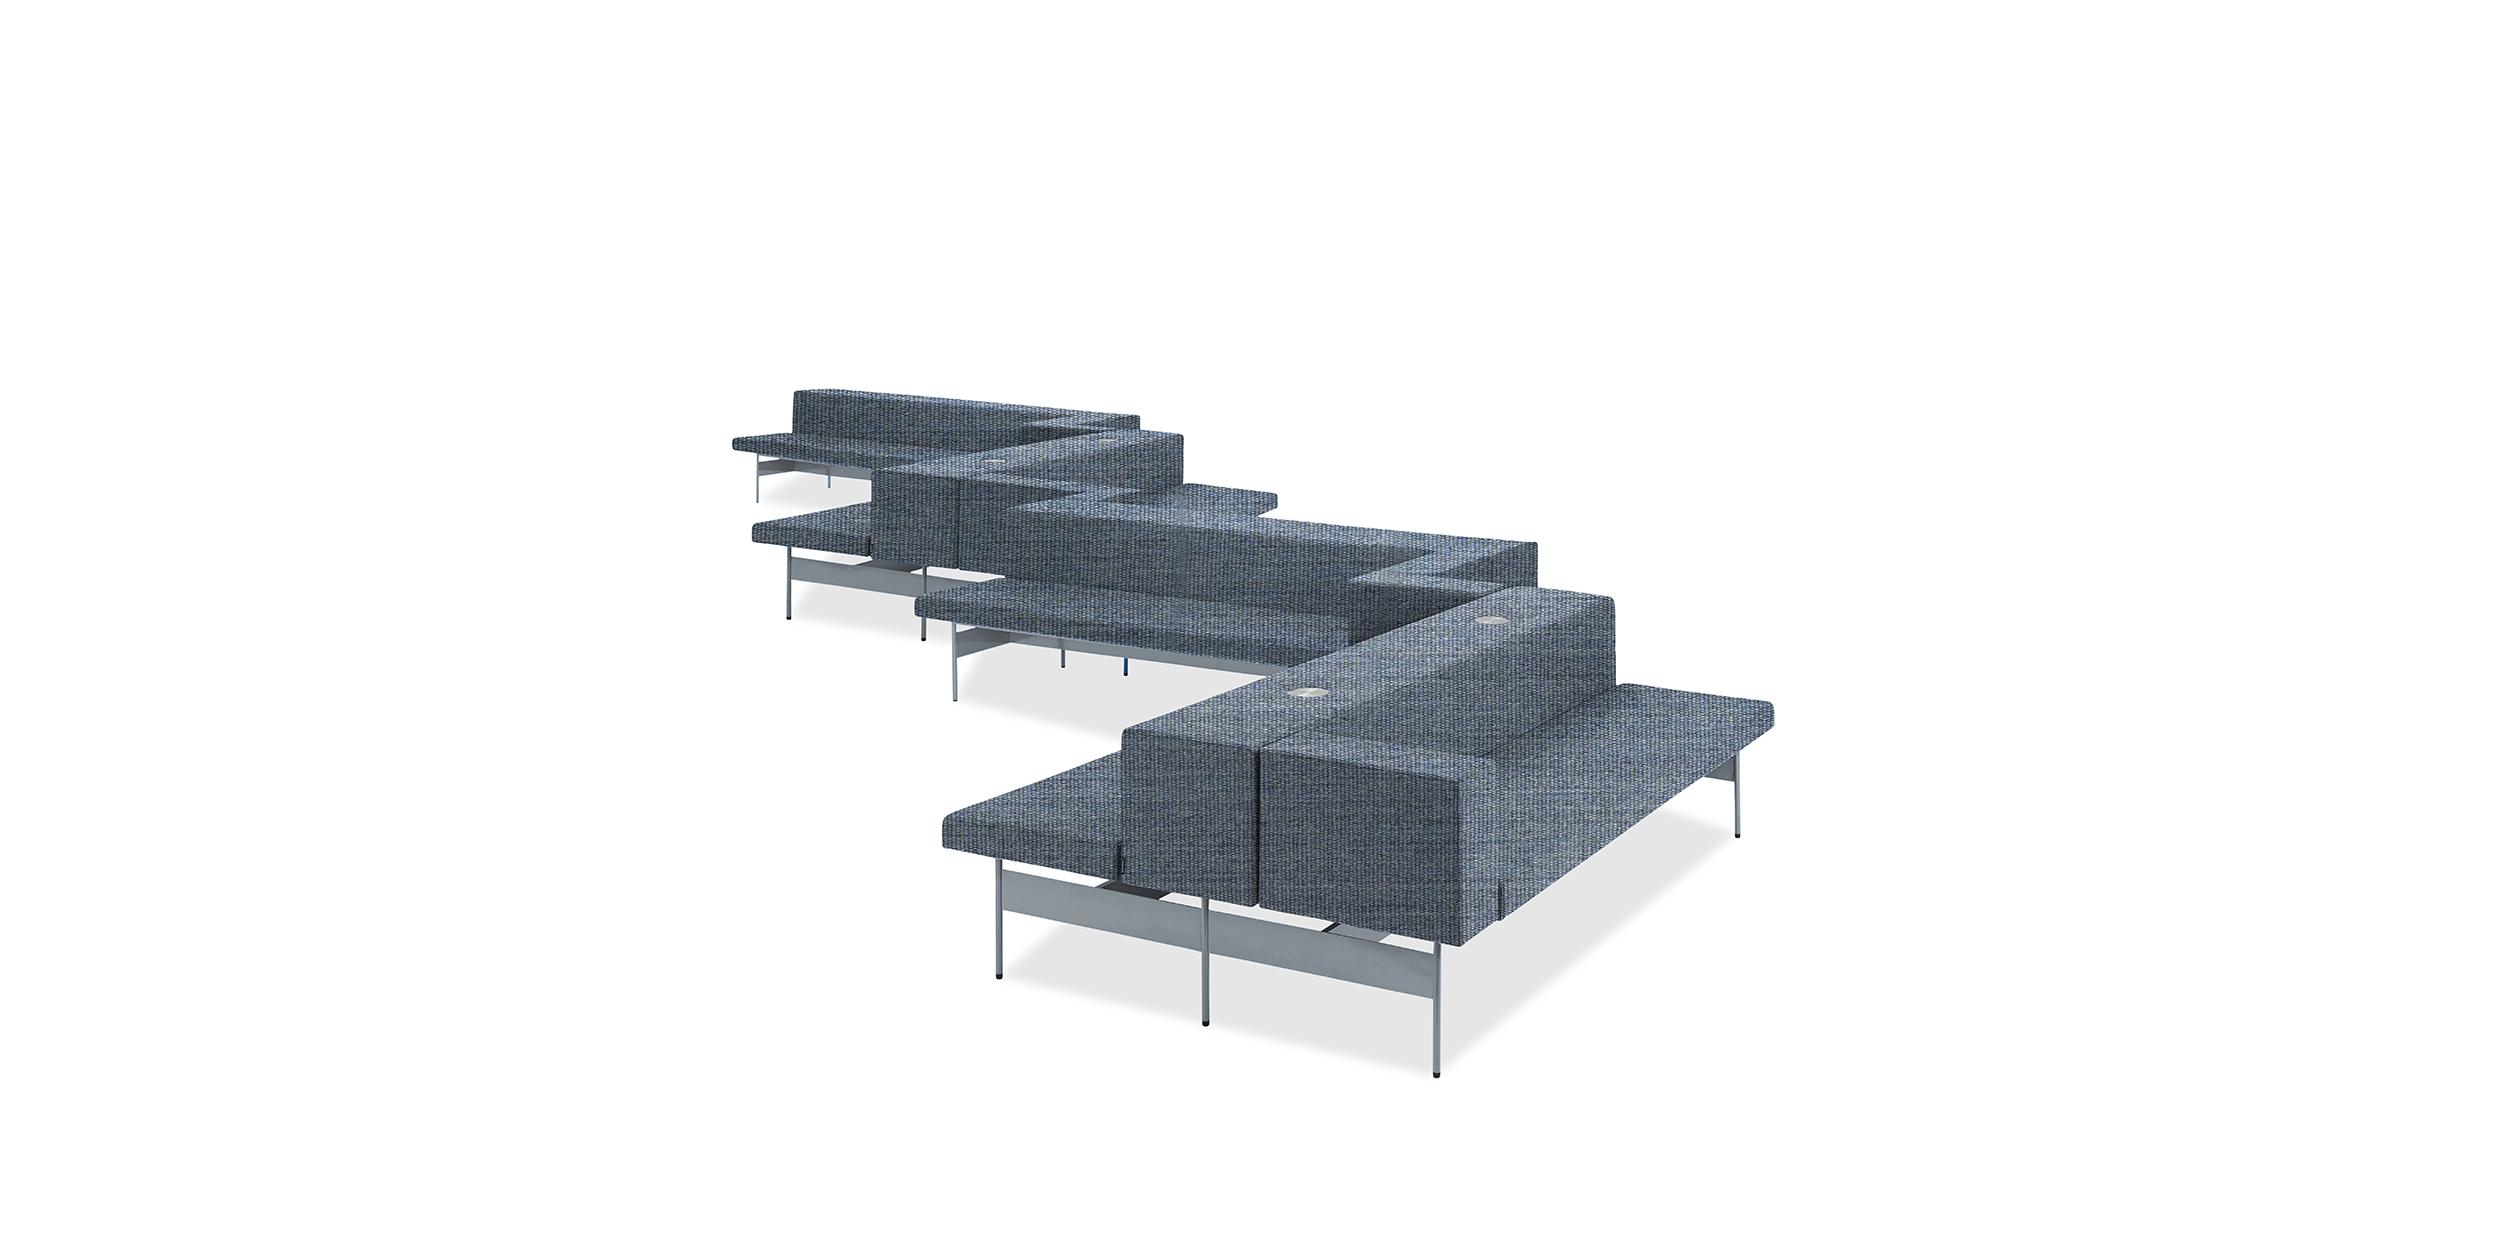 Sofa Systems